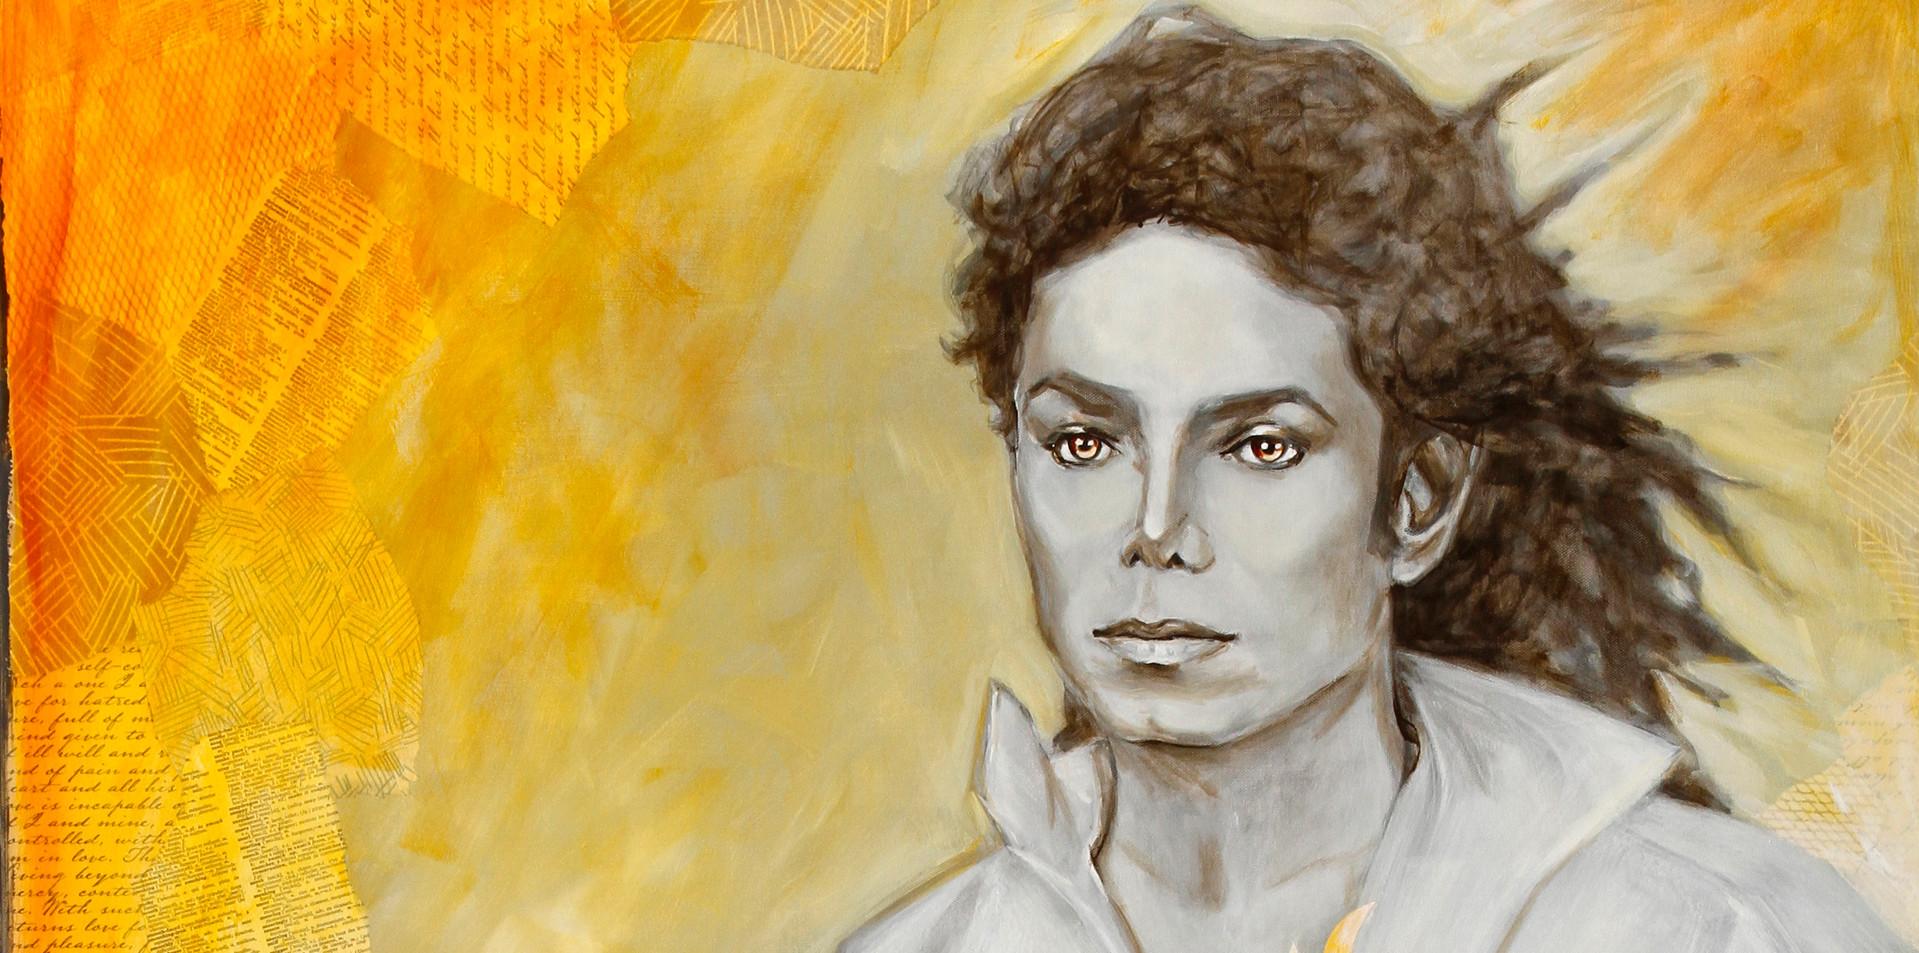 Michael's Sacred Heart